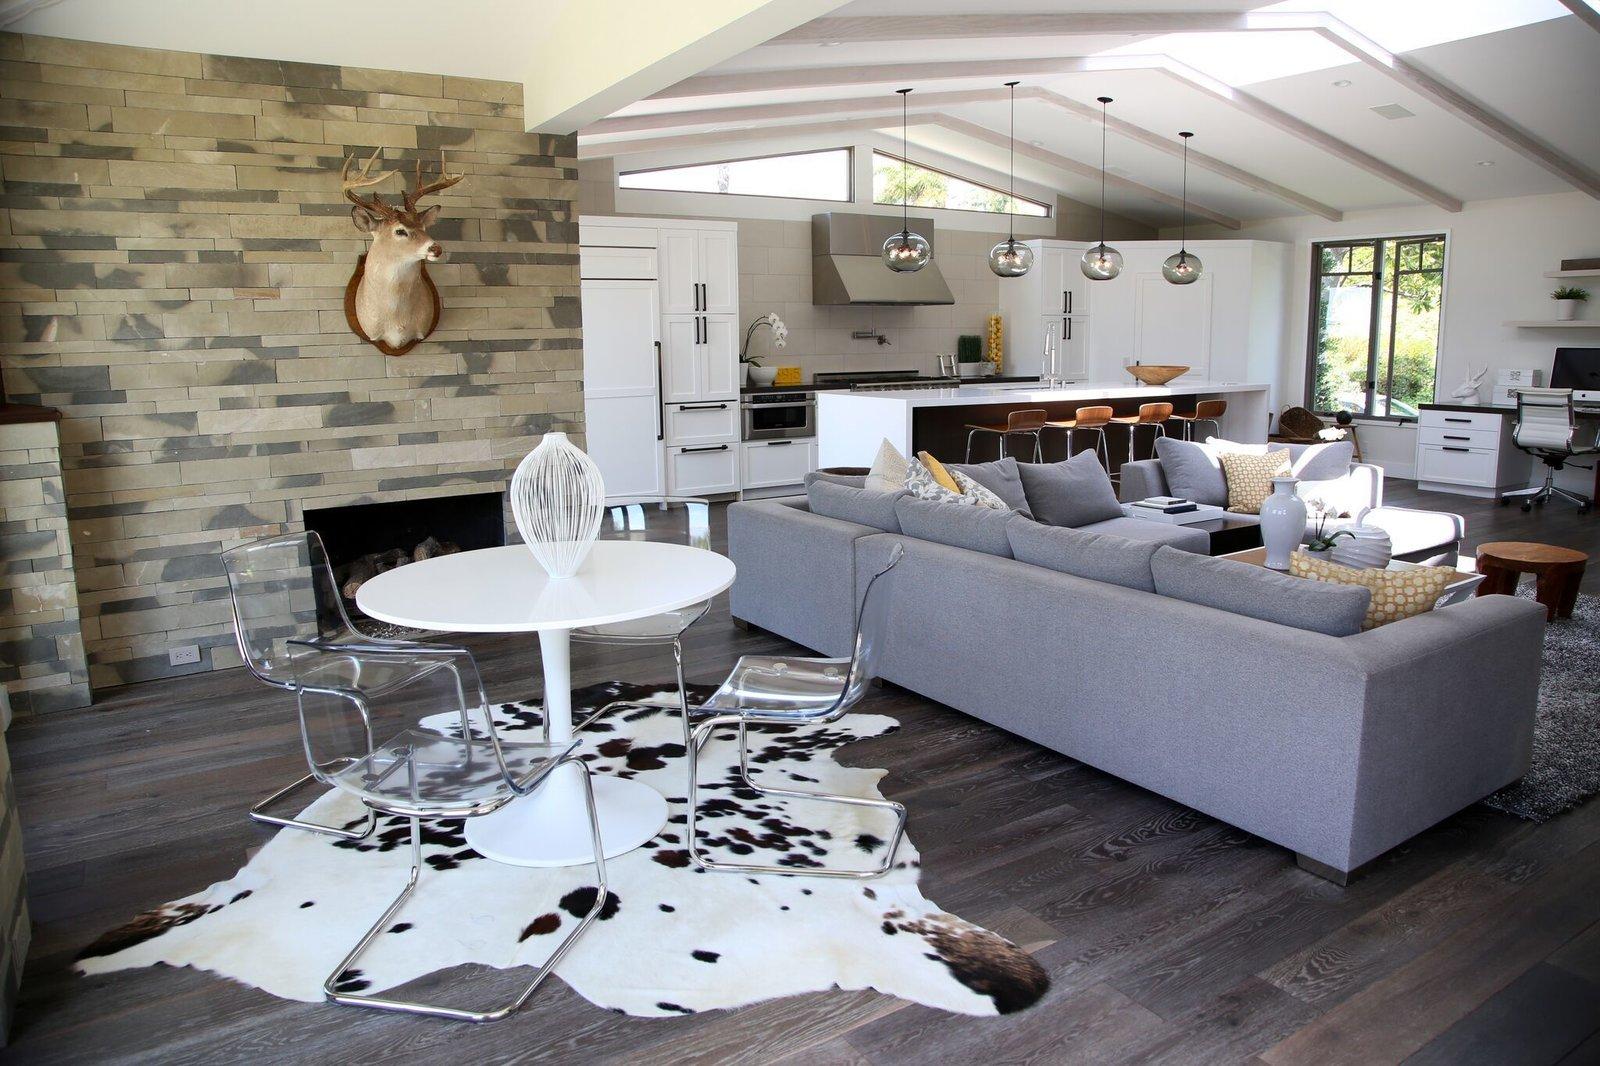 Photo 4 of 5 in Kitchen Island Modern Lighting Adds Minimalist Feel to California Home